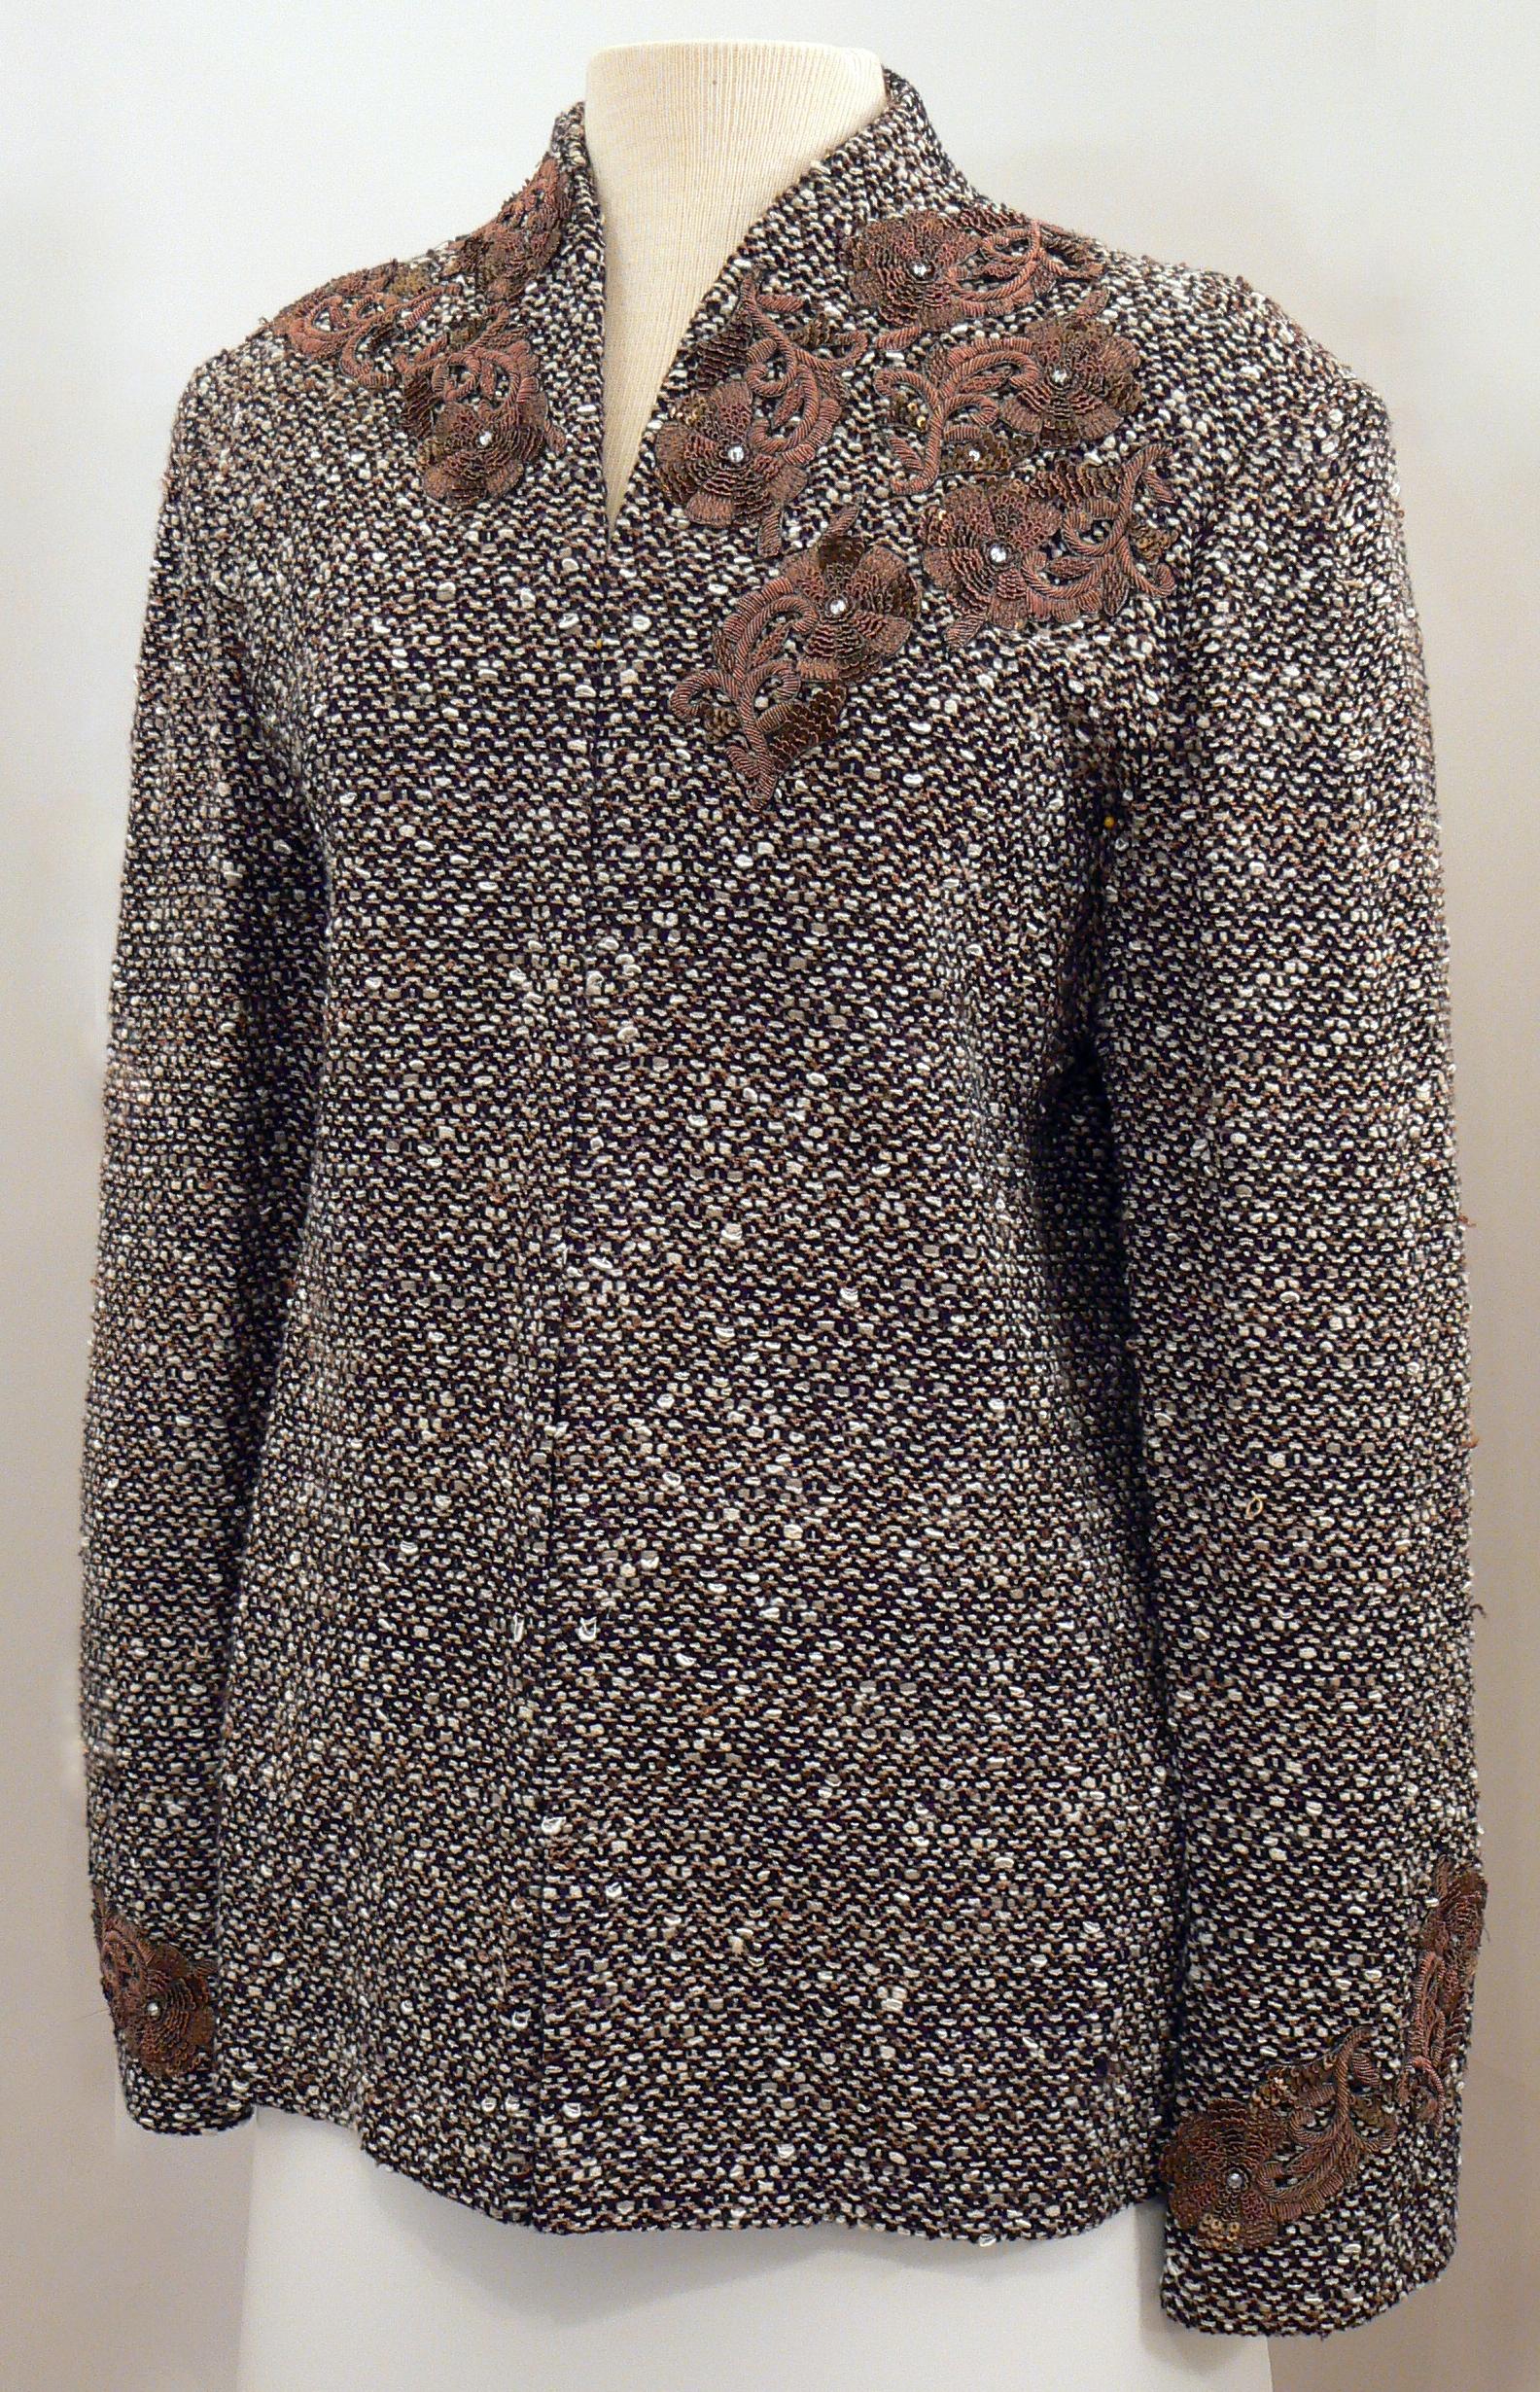 Handwoven Clothing, Wearable Art, Kathleen Weir-West, 9-001.JPG